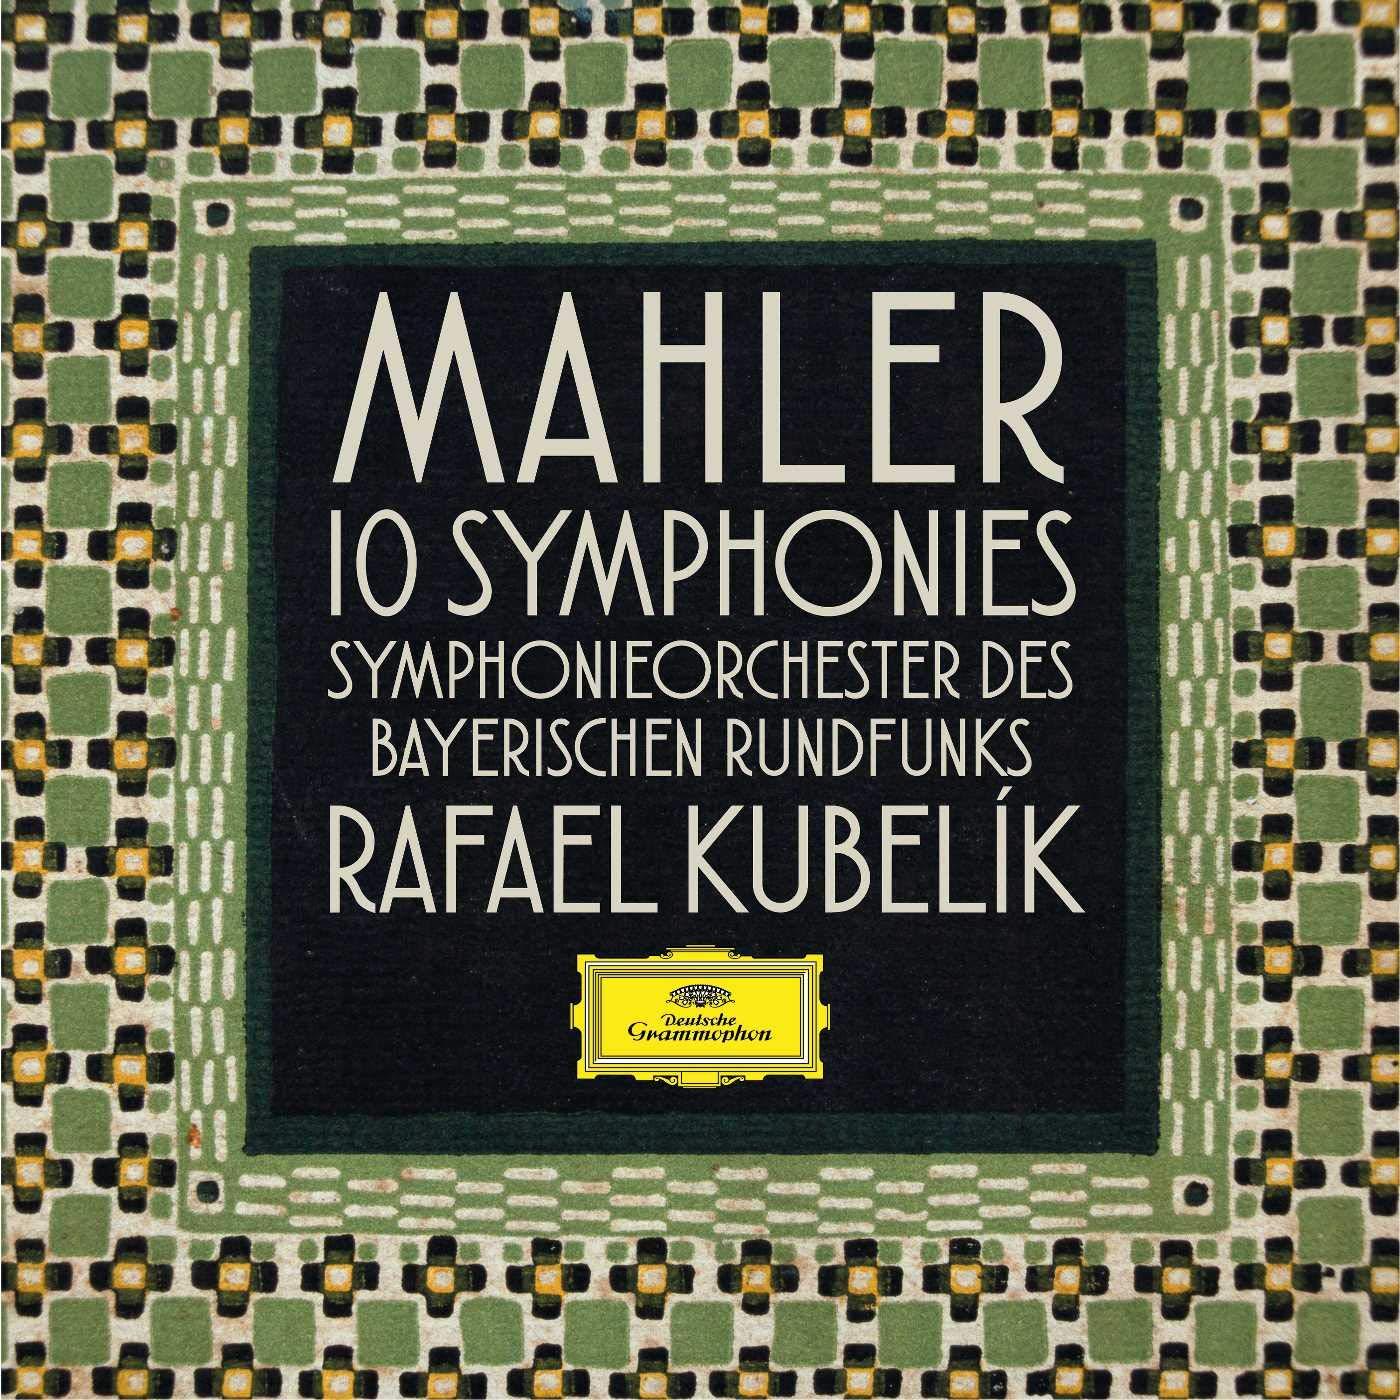 Dedication Mahler: 10 Symphonies CD Audio + Blu-ray Soldering